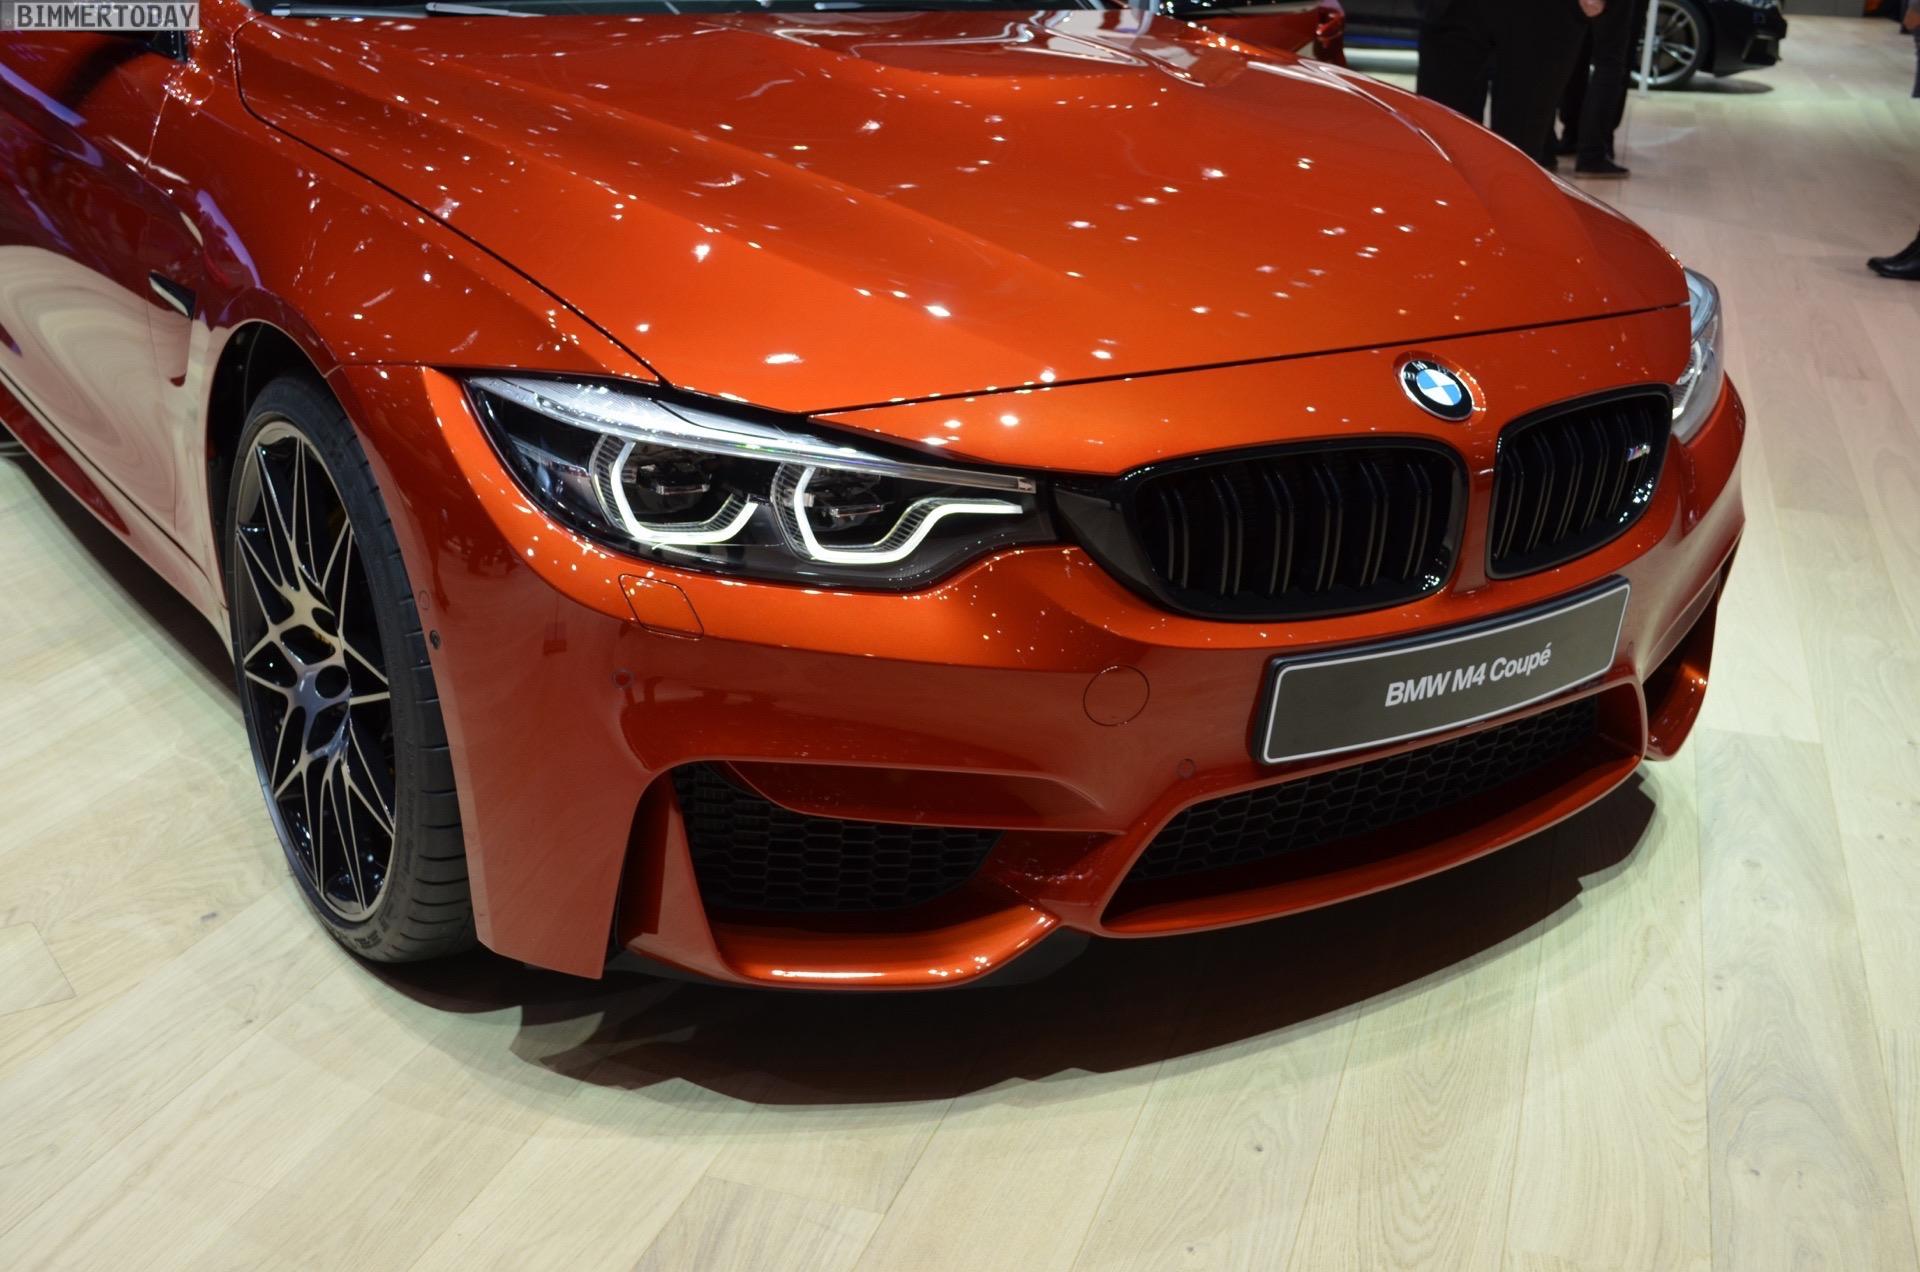 2017 BMW M4 F82 LCI Facelift Competition Coupe Sakhir Orange Genf Live 31